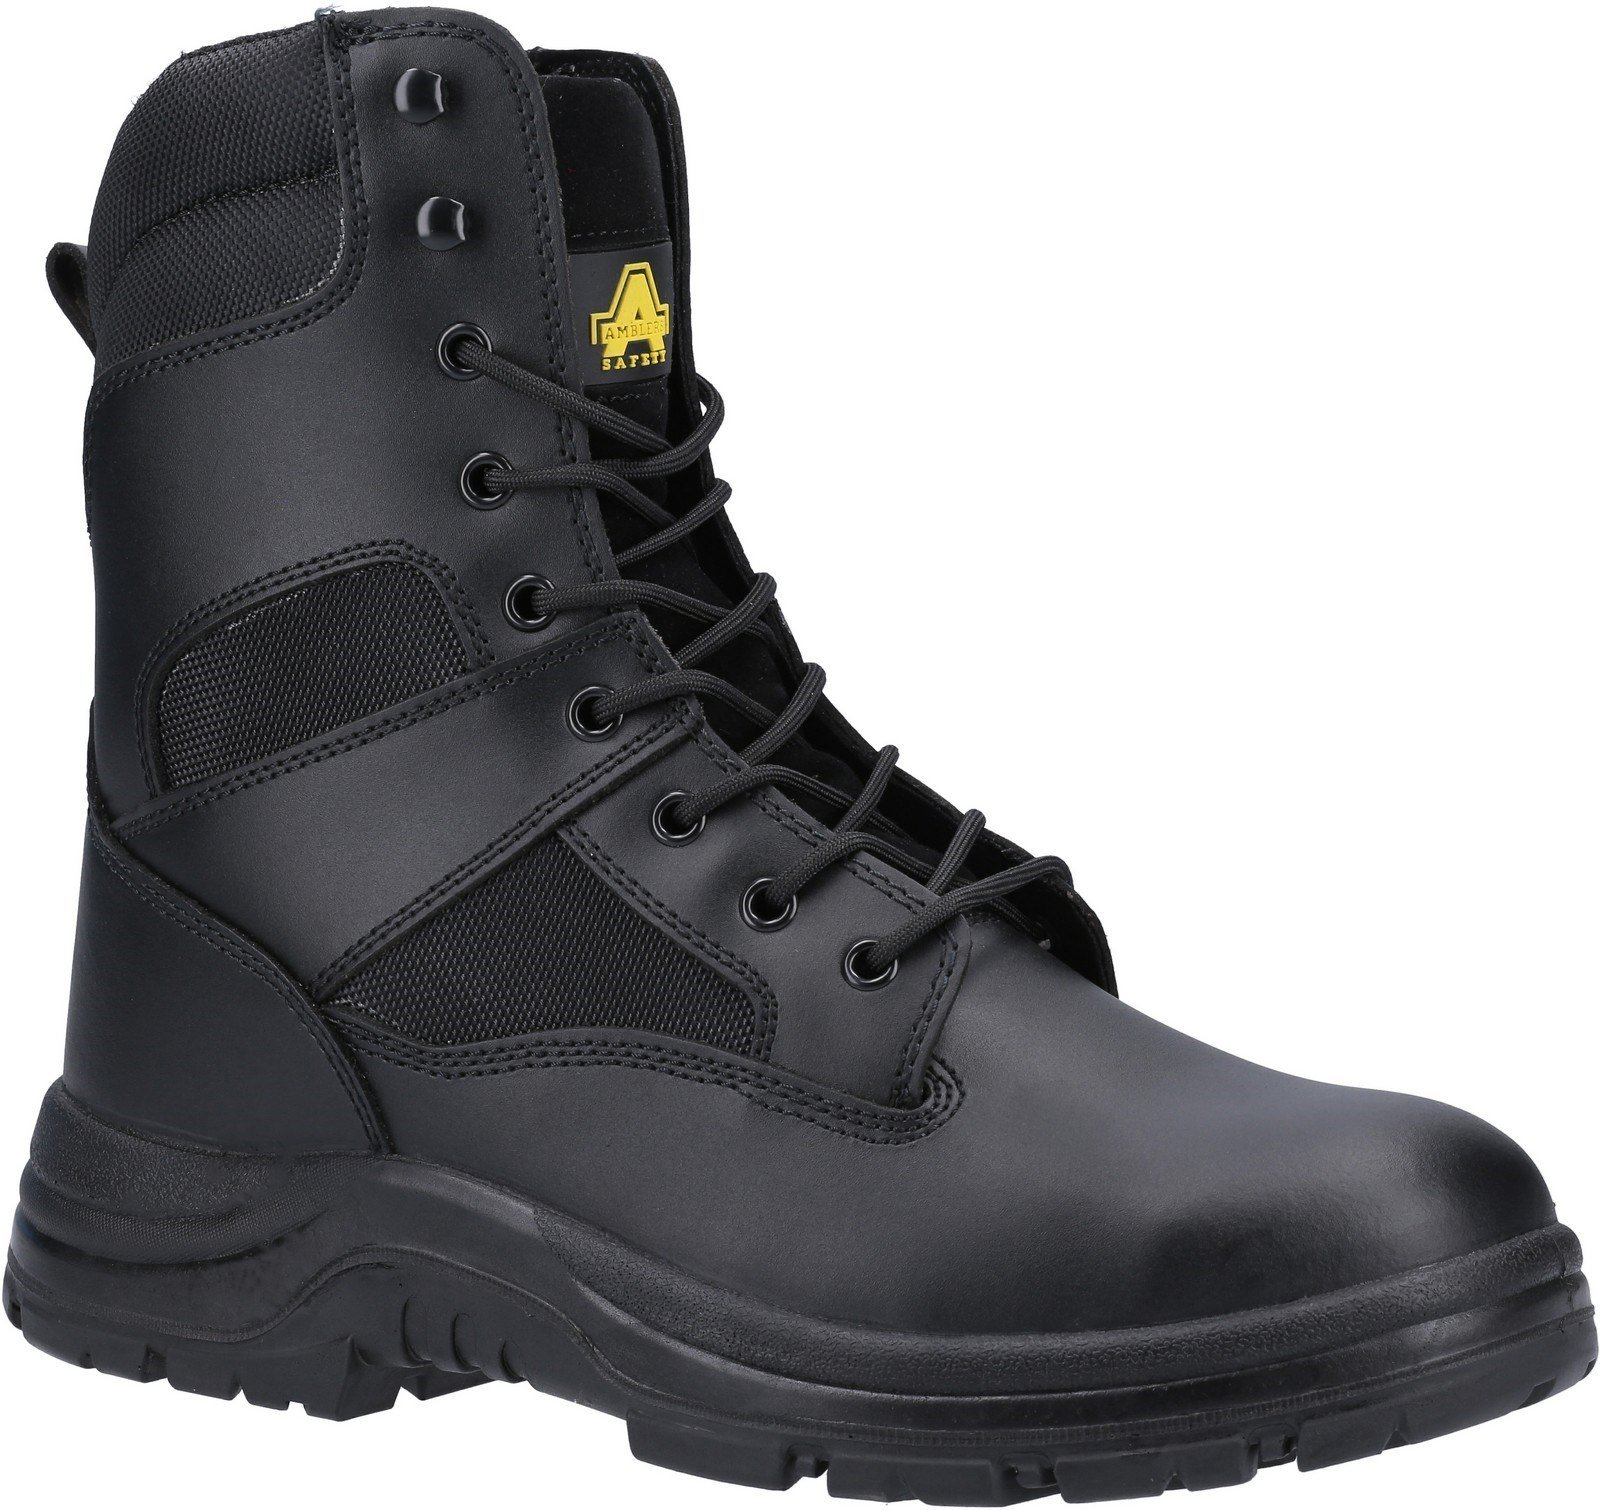 Amblers Unisex Safety Water Resistant Hi leg Lace Up Boot Black 21396 - Black 14